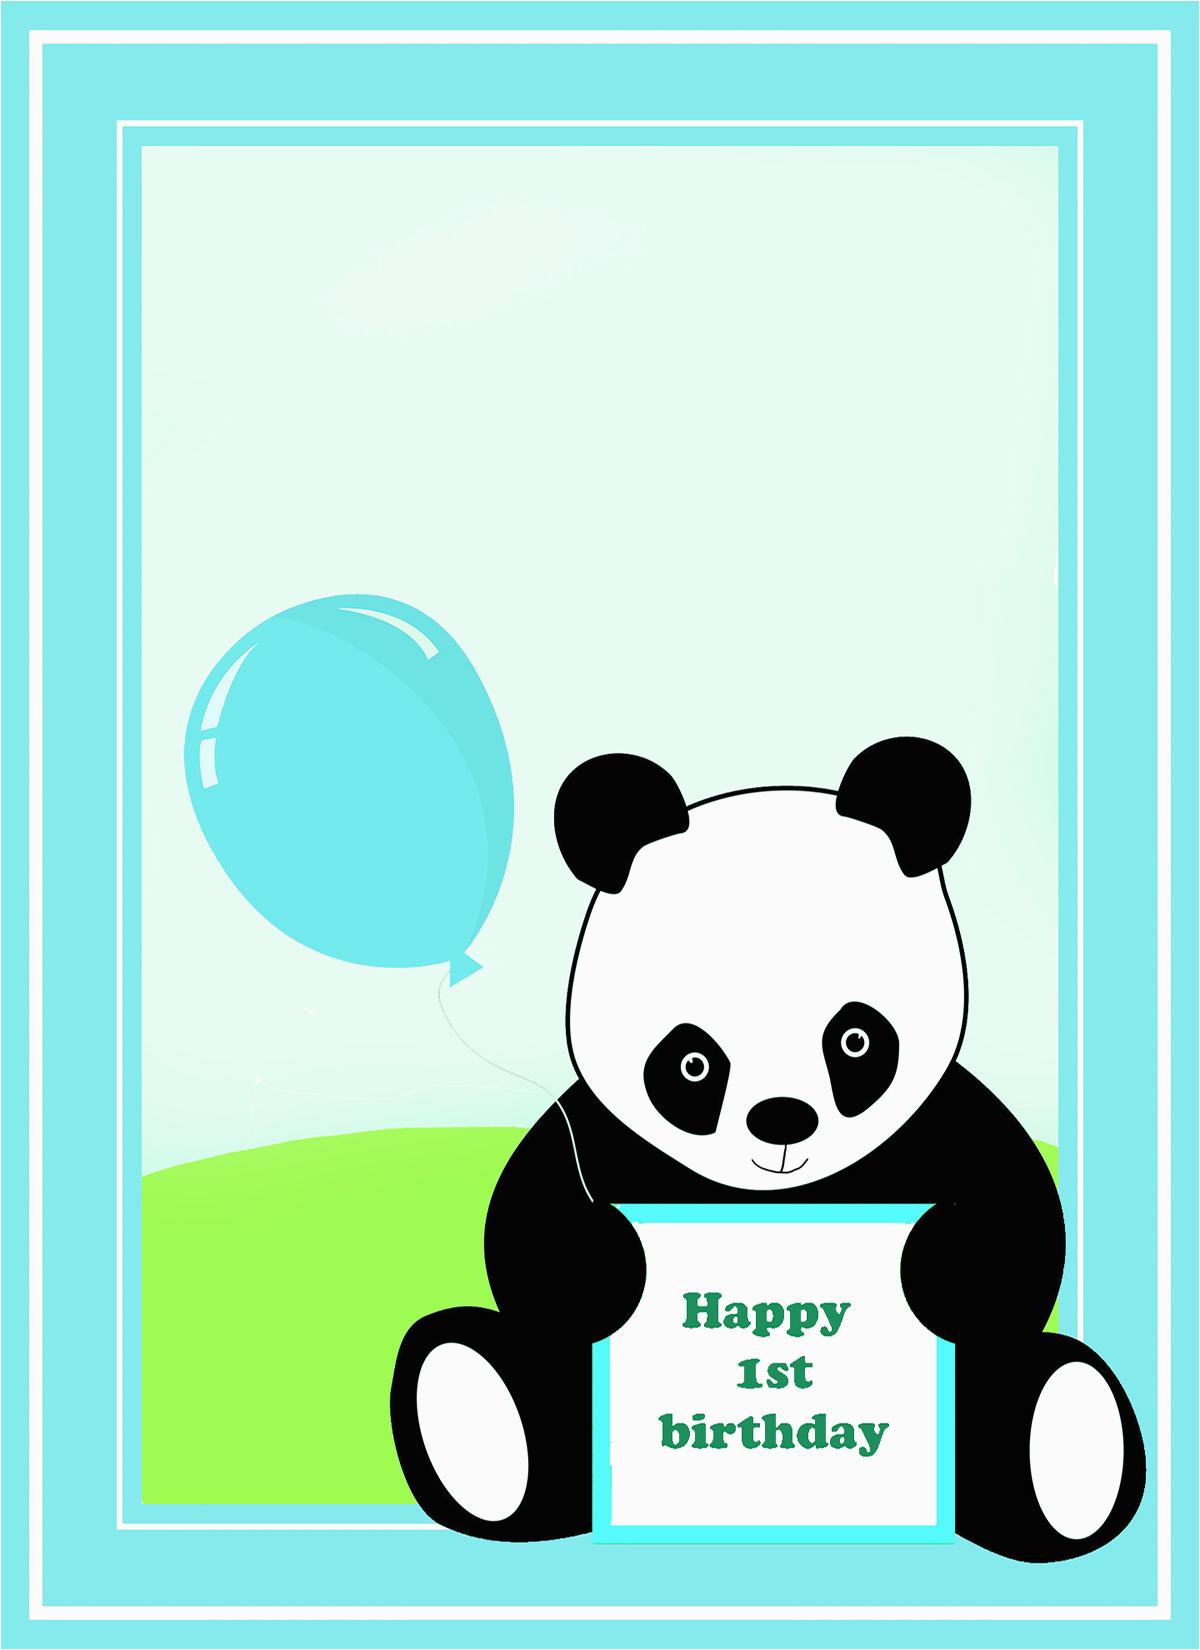 Panda Birthday Card Template | Birthdaybuzz - Panda Bear Invitations Free Printable